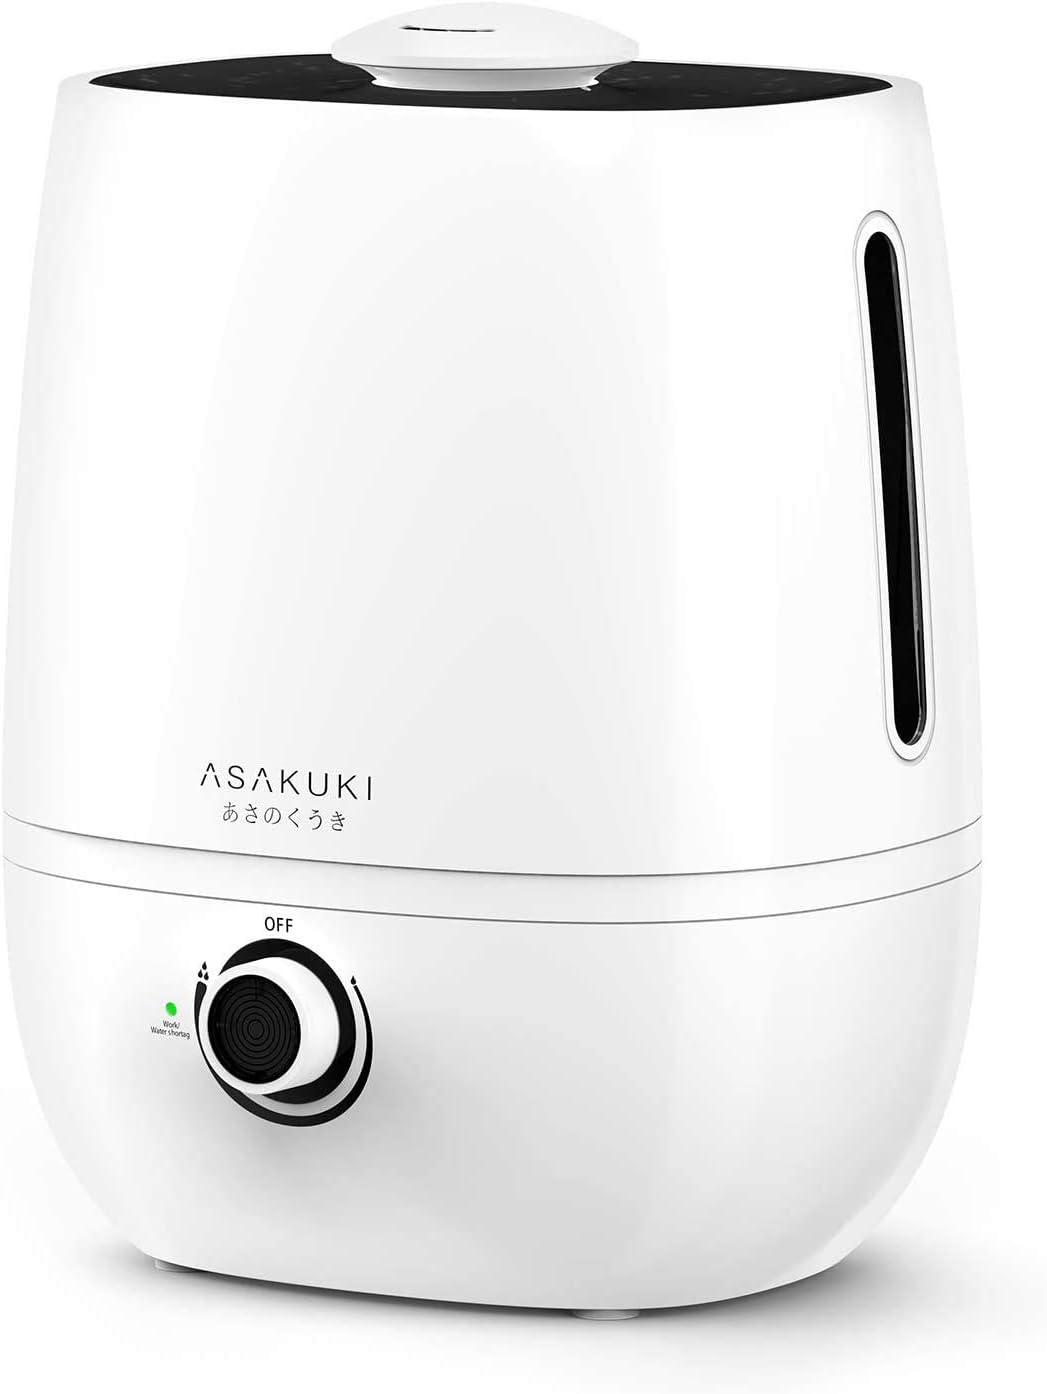 Lowest price challenge ASAKUKI Cool Max 58% OFF Mist Humidifier Large 4L Ultrasonic Capacity Diffu